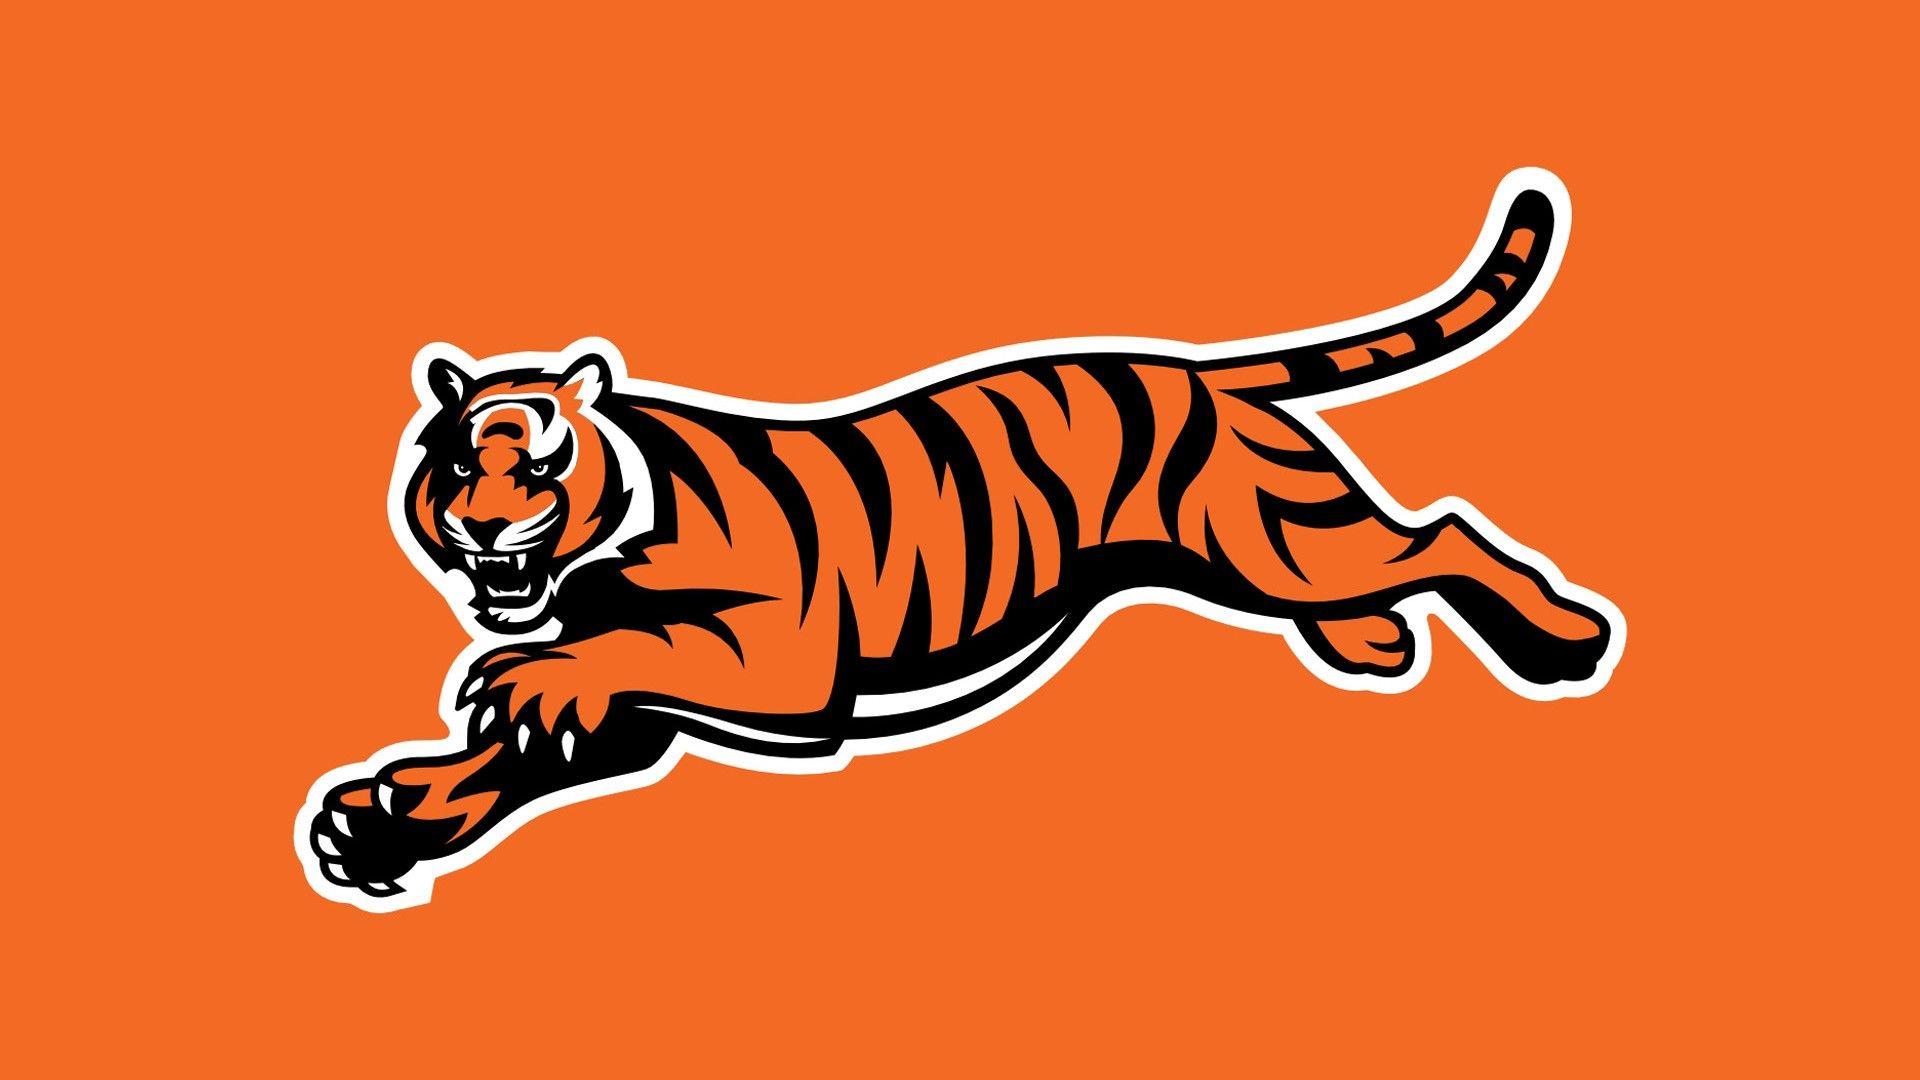 Cincinnati Bengals Hd Wallpapers 2021 Nfl Football Wallpapers Cincinnati Bengals Cincinnati Bengals Football Bengals